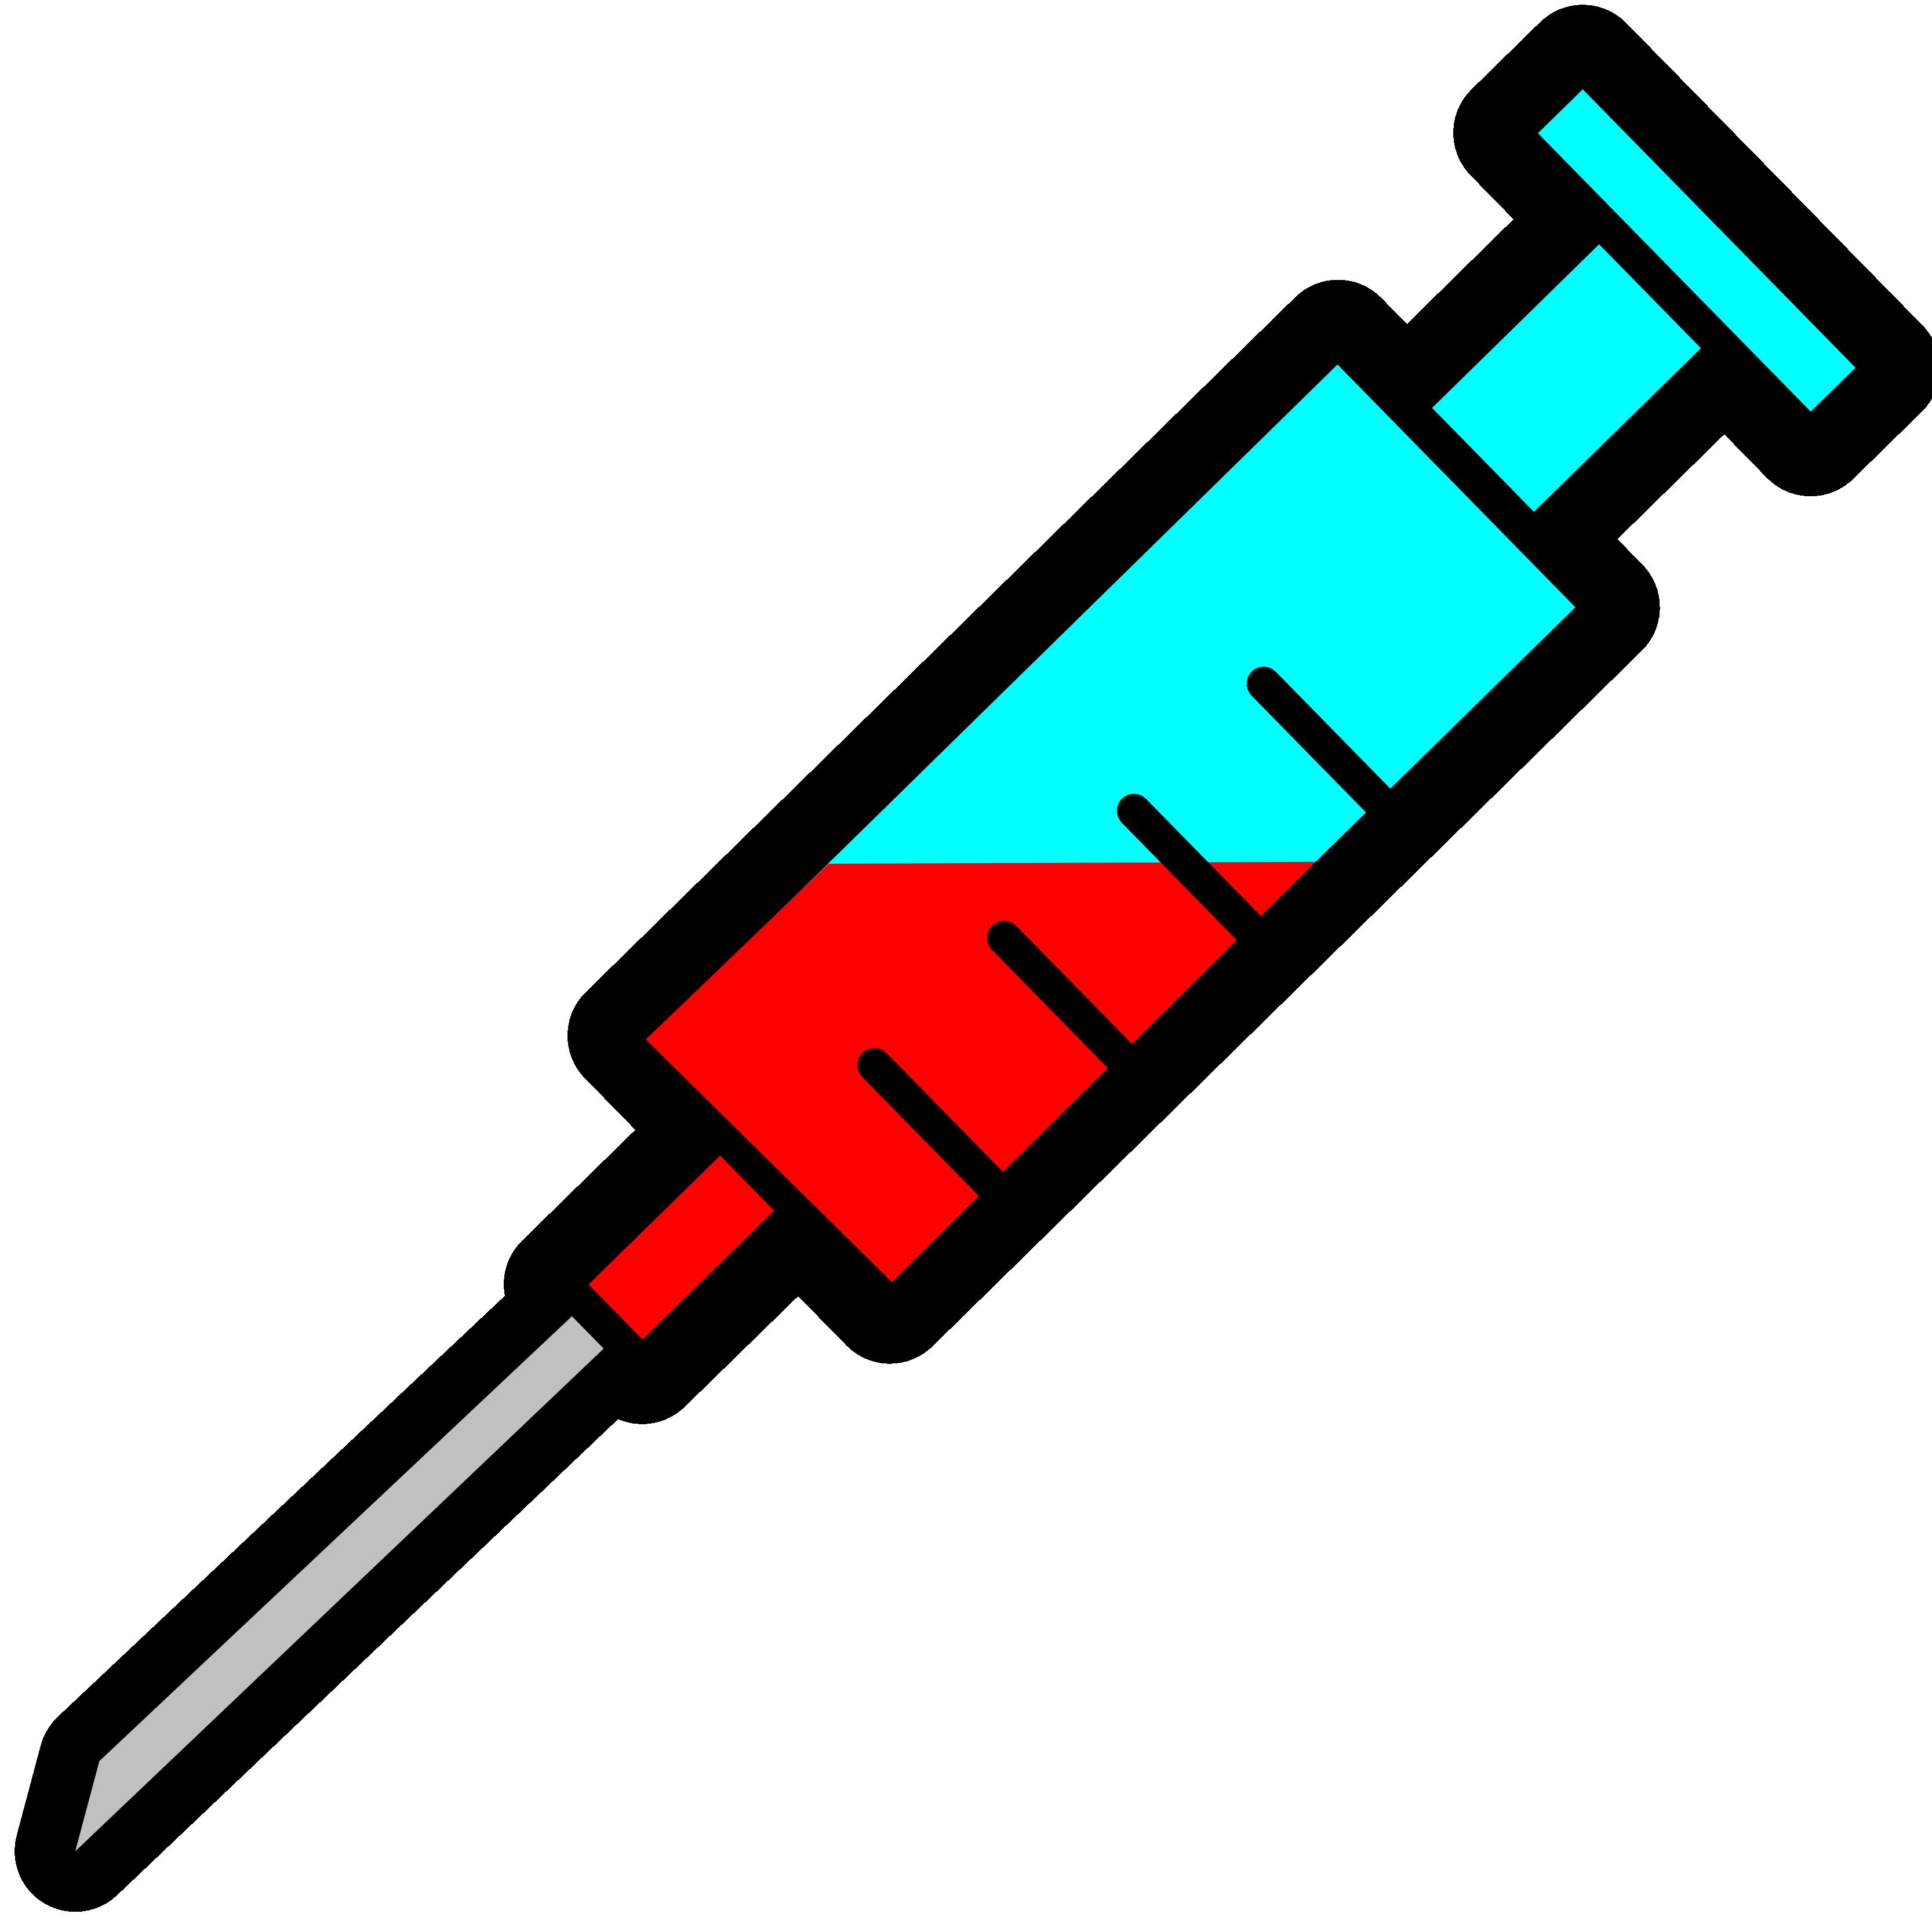 Syringe clip art.